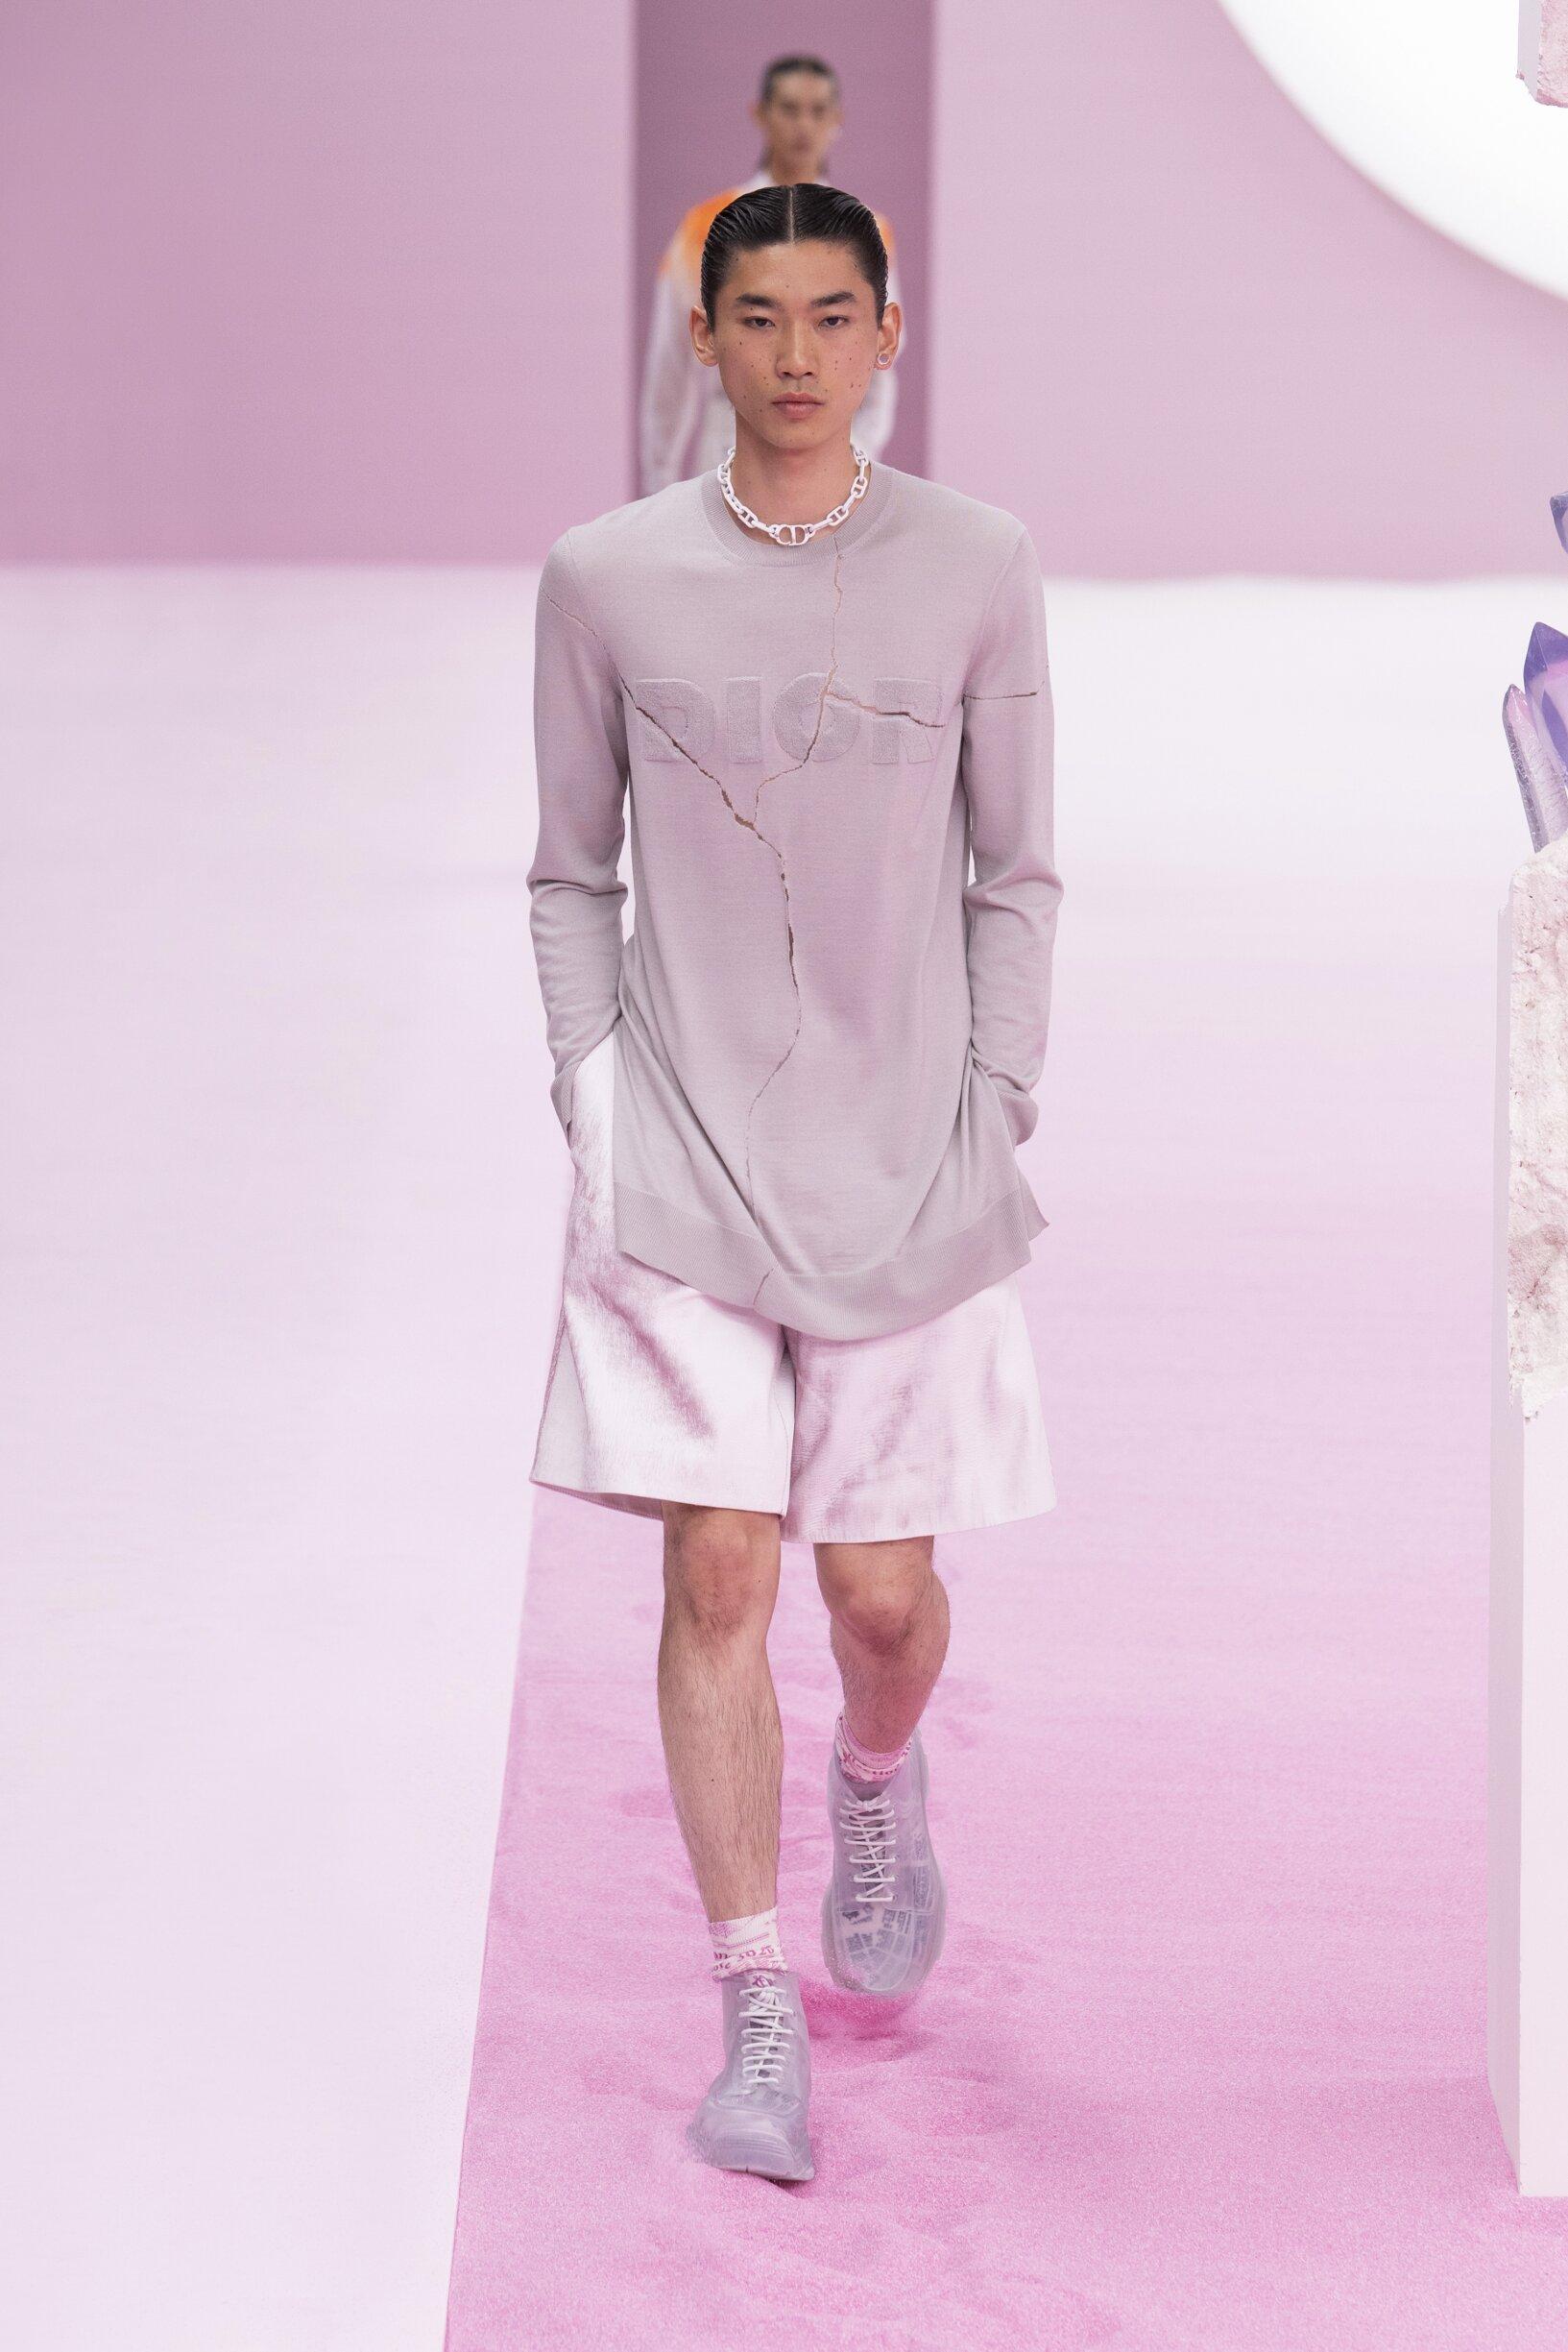 Dior SS 2020 Menswear